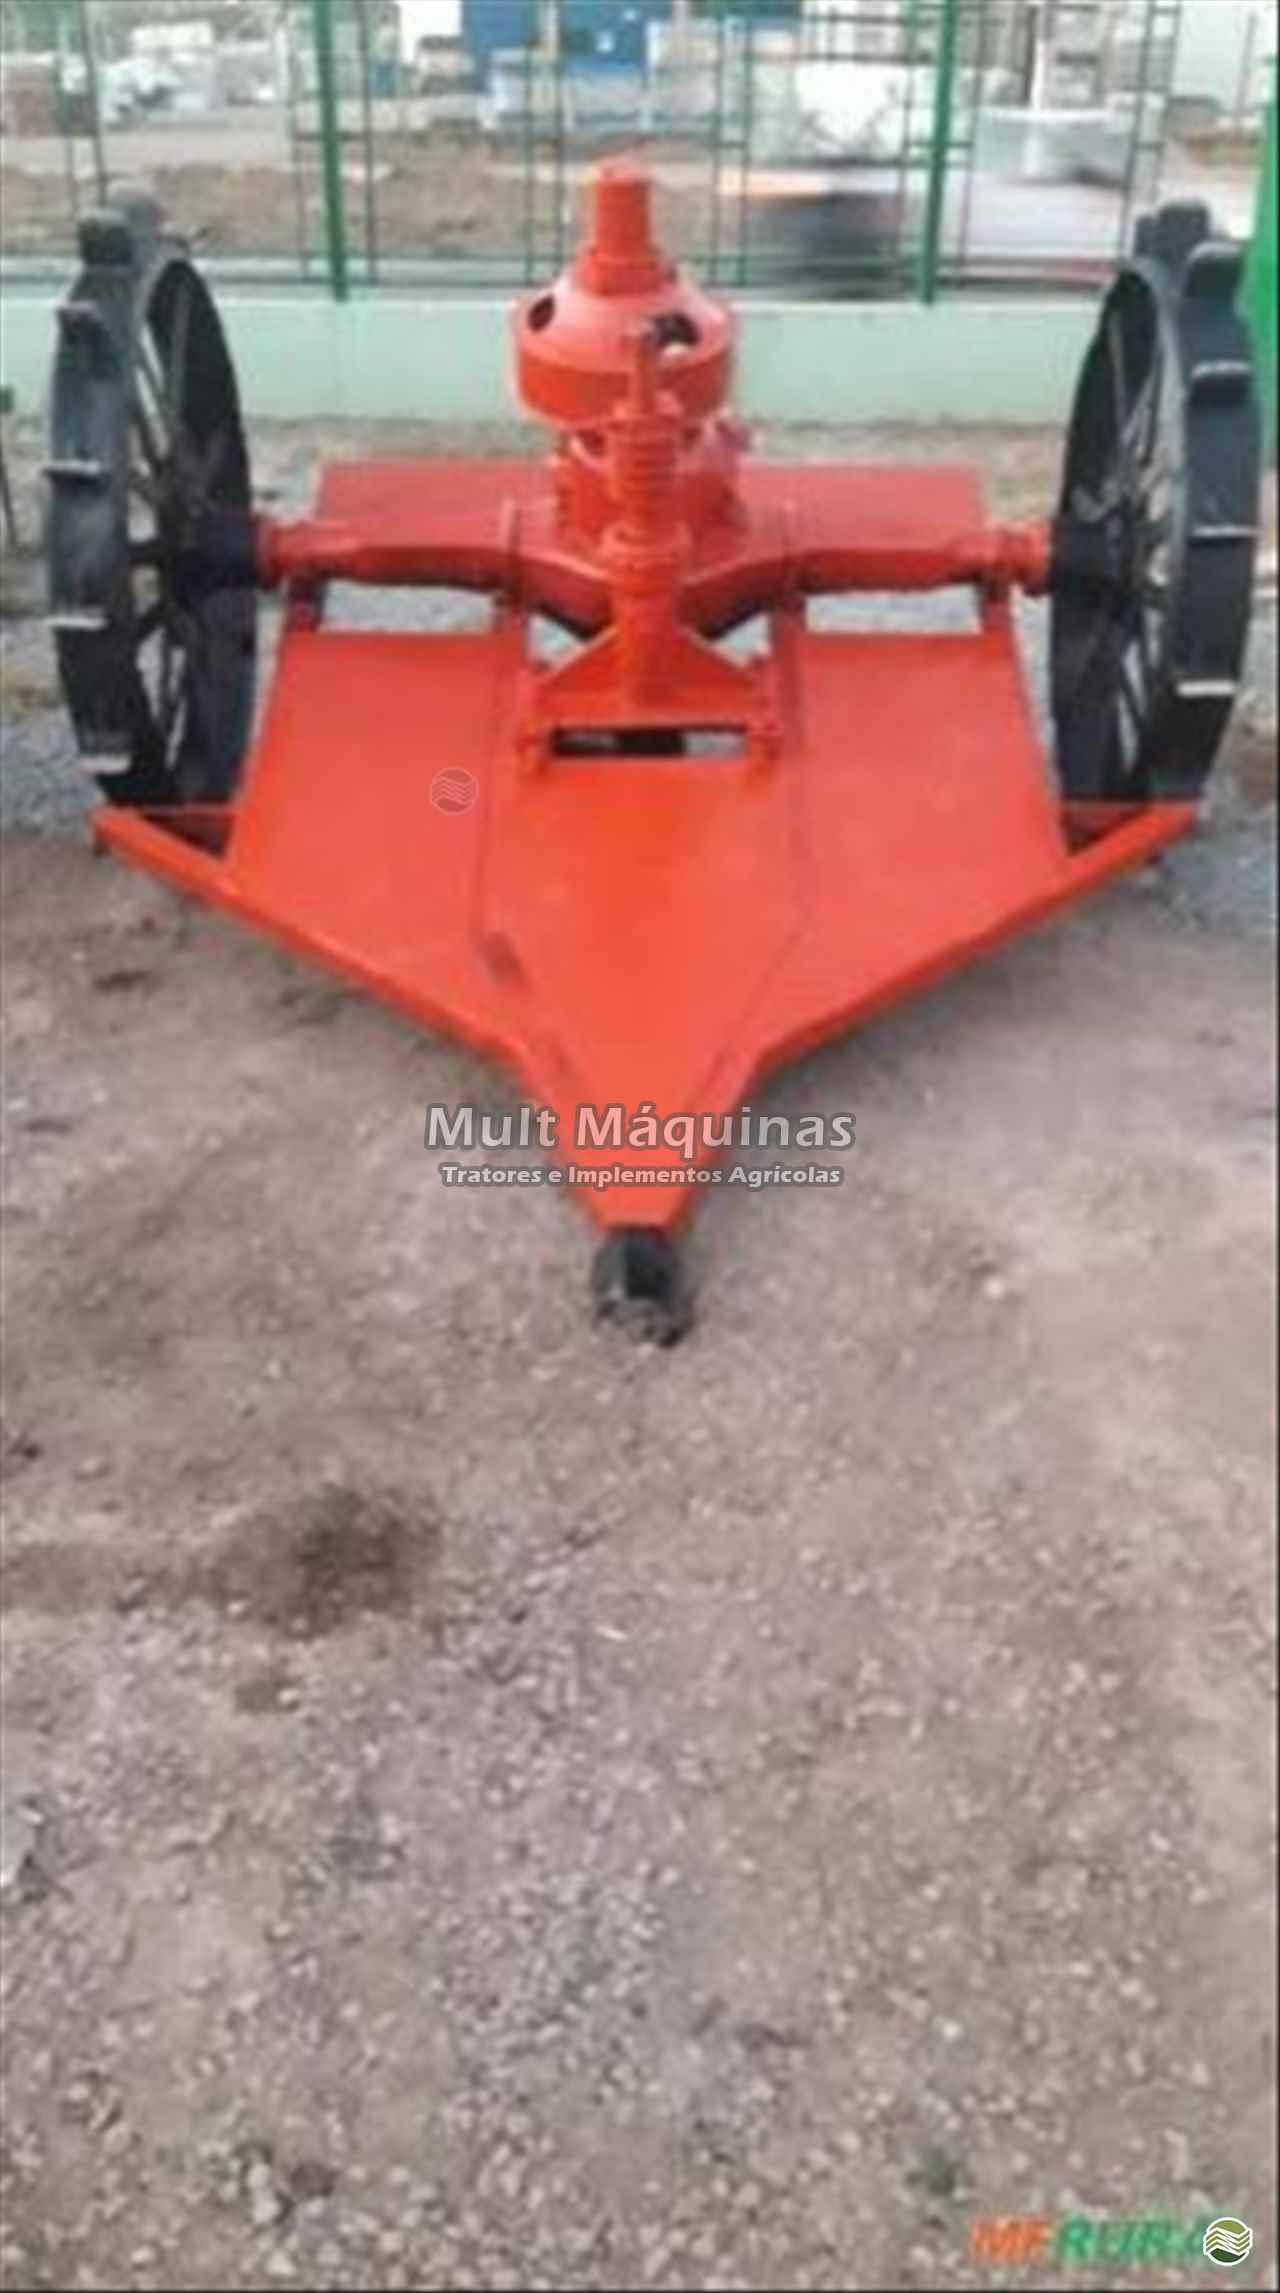 IMPLEMENTOS AGRICOLAS ROCADEIRA ROCADEIRA ARRASTO Mult Máquinas CUIABA MATO GROSSO MT